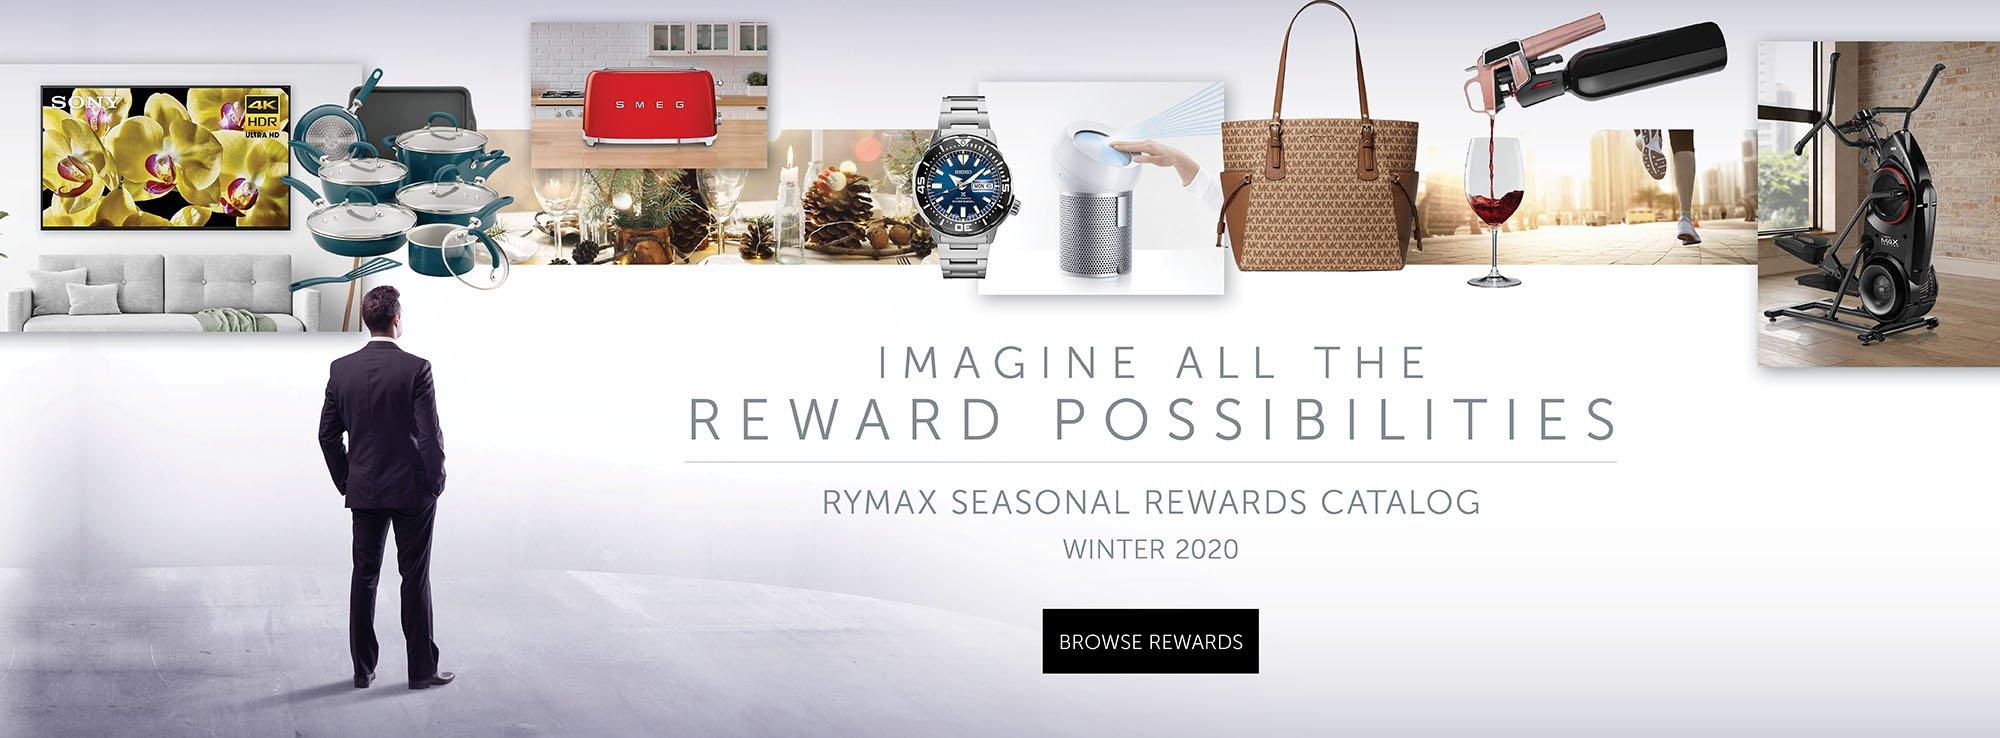 Rymax Product Catalog Winter 2020